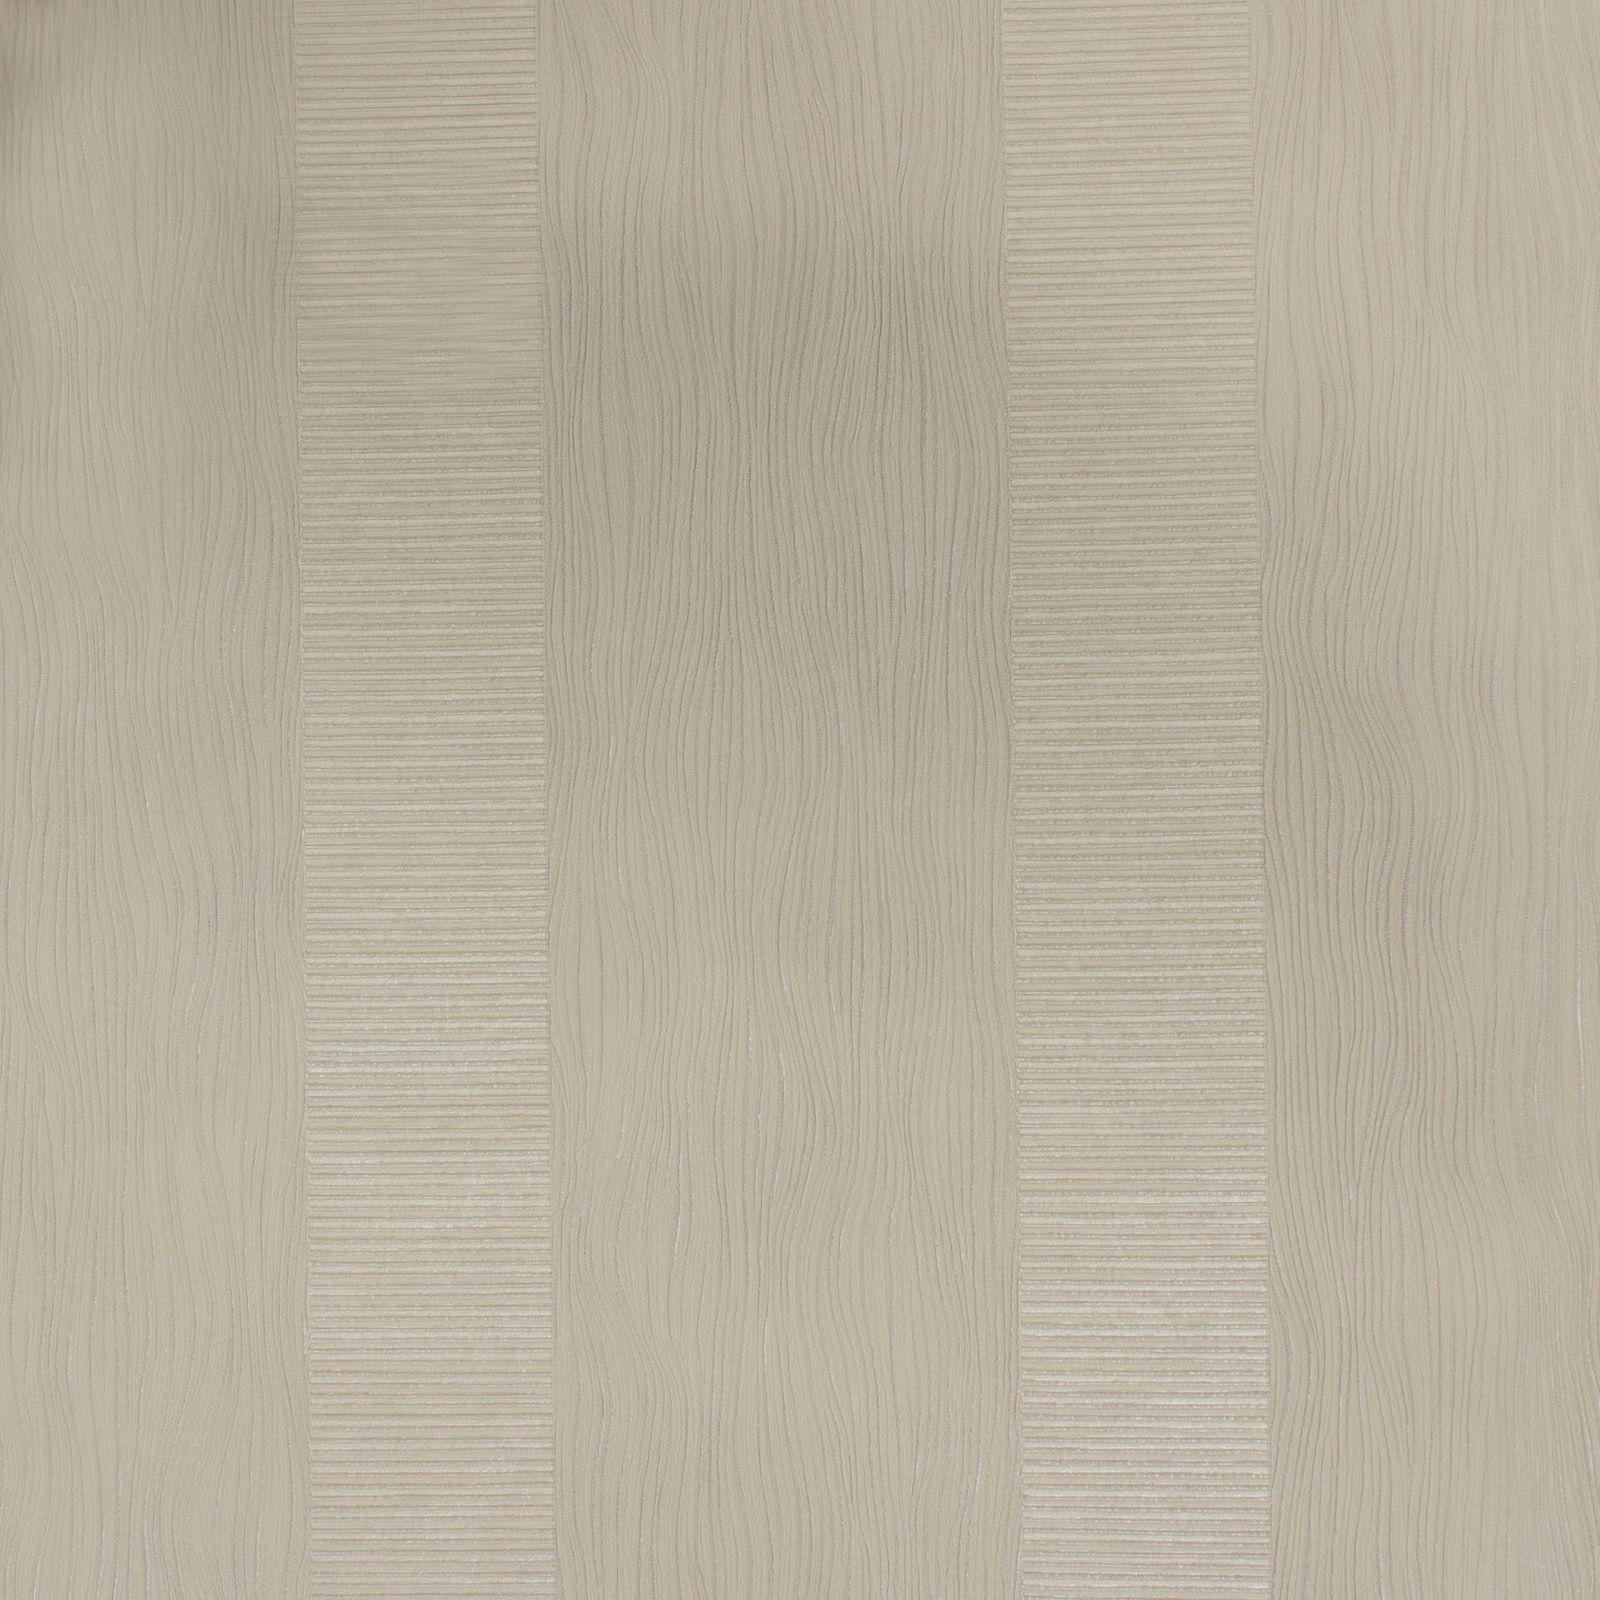 luigi colani visions vliestapete marburg tapete 53362 struktur grau. Black Bedroom Furniture Sets. Home Design Ideas